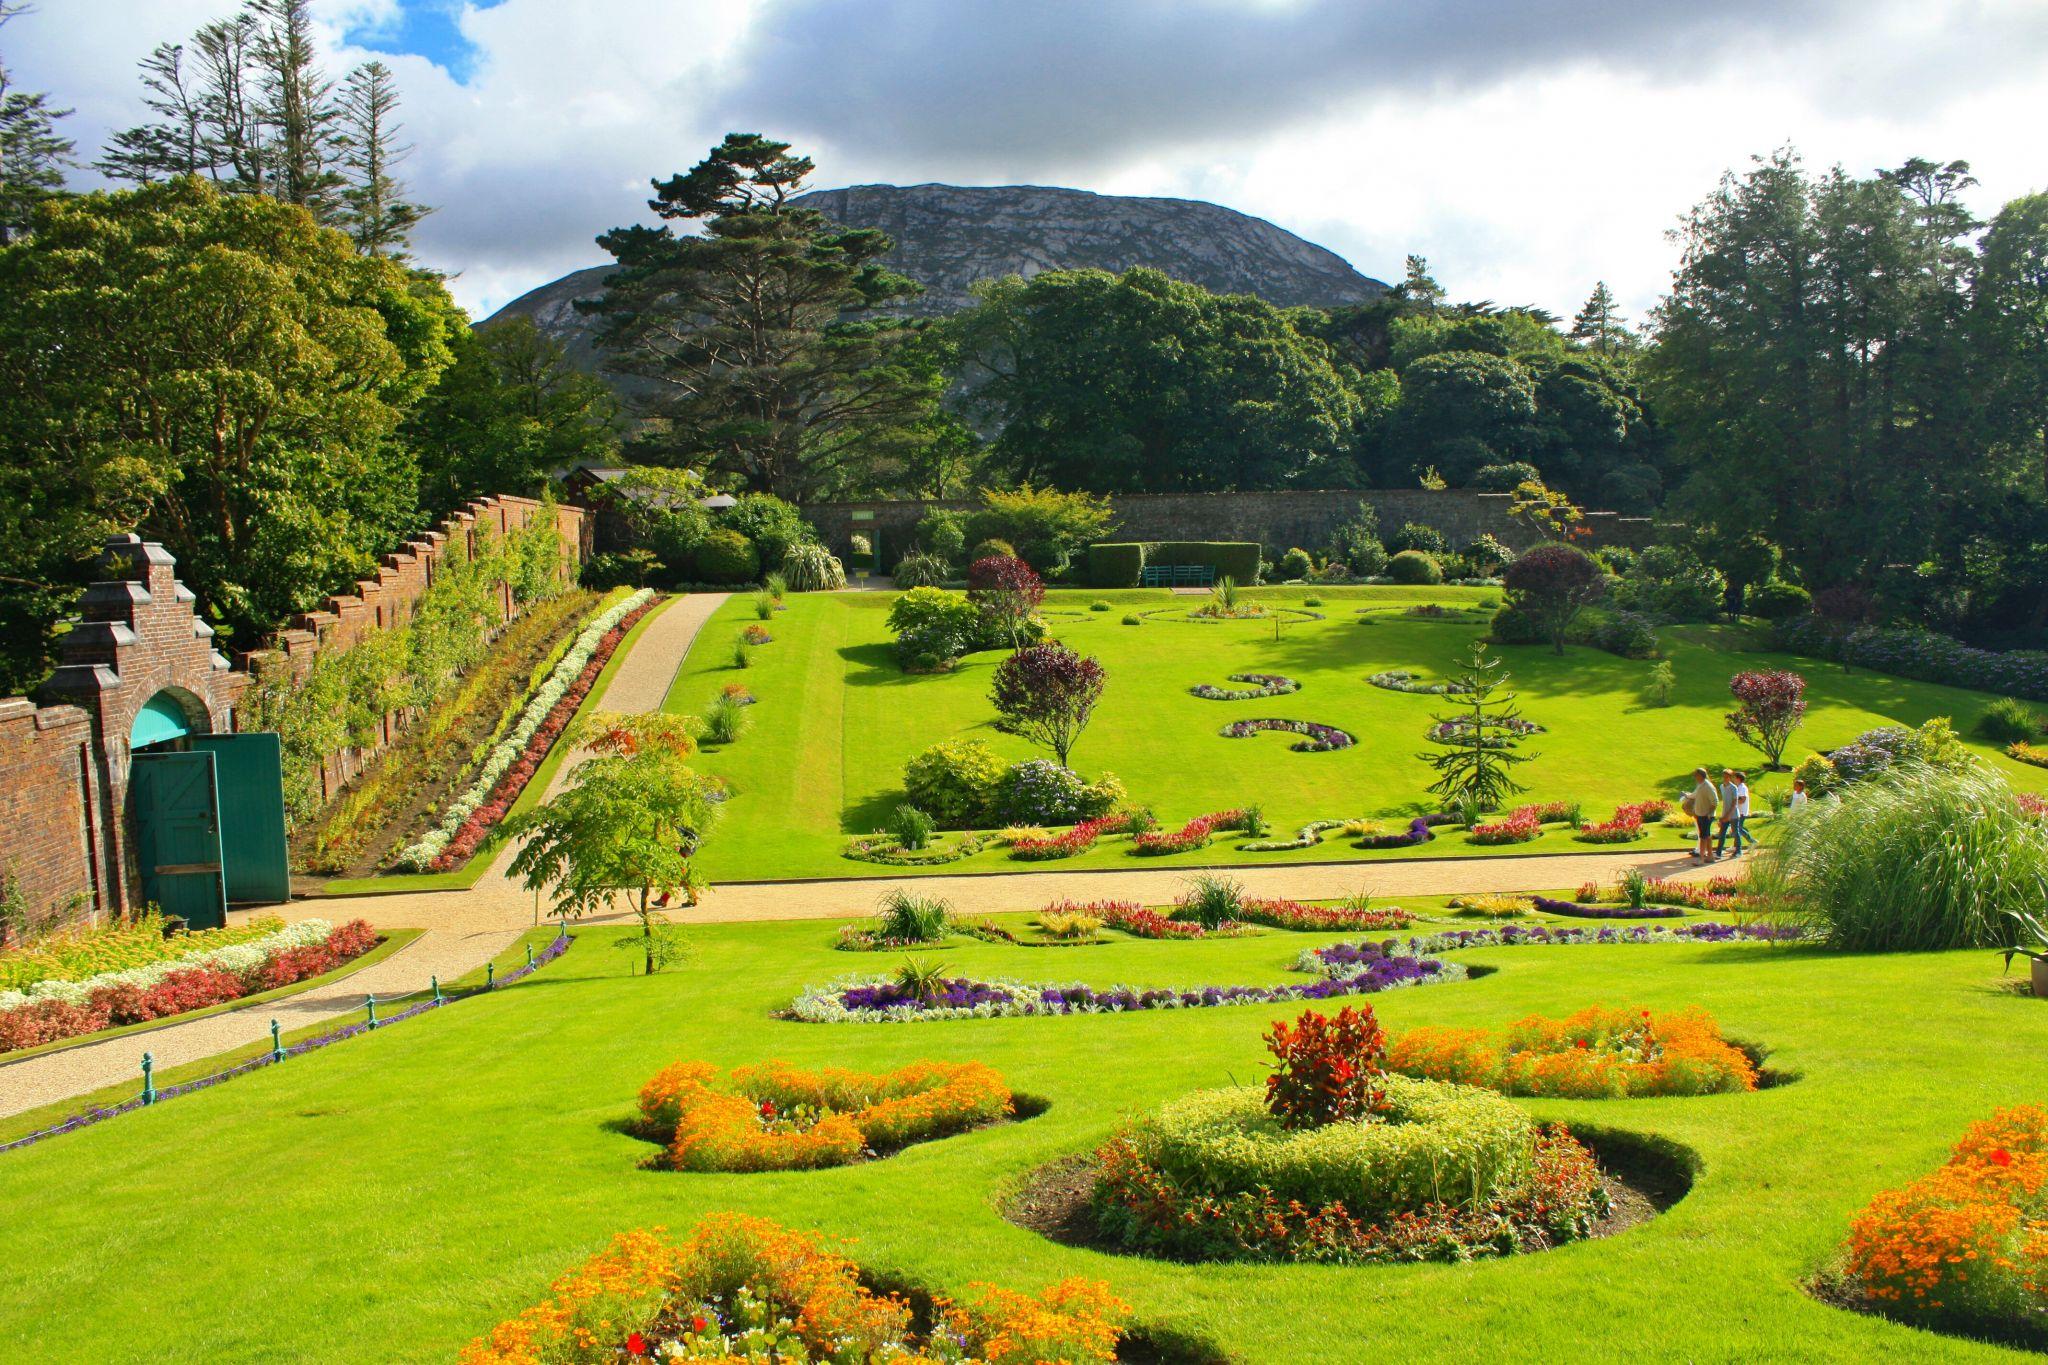 Kylemore Abbey Walled Garden, Ireland